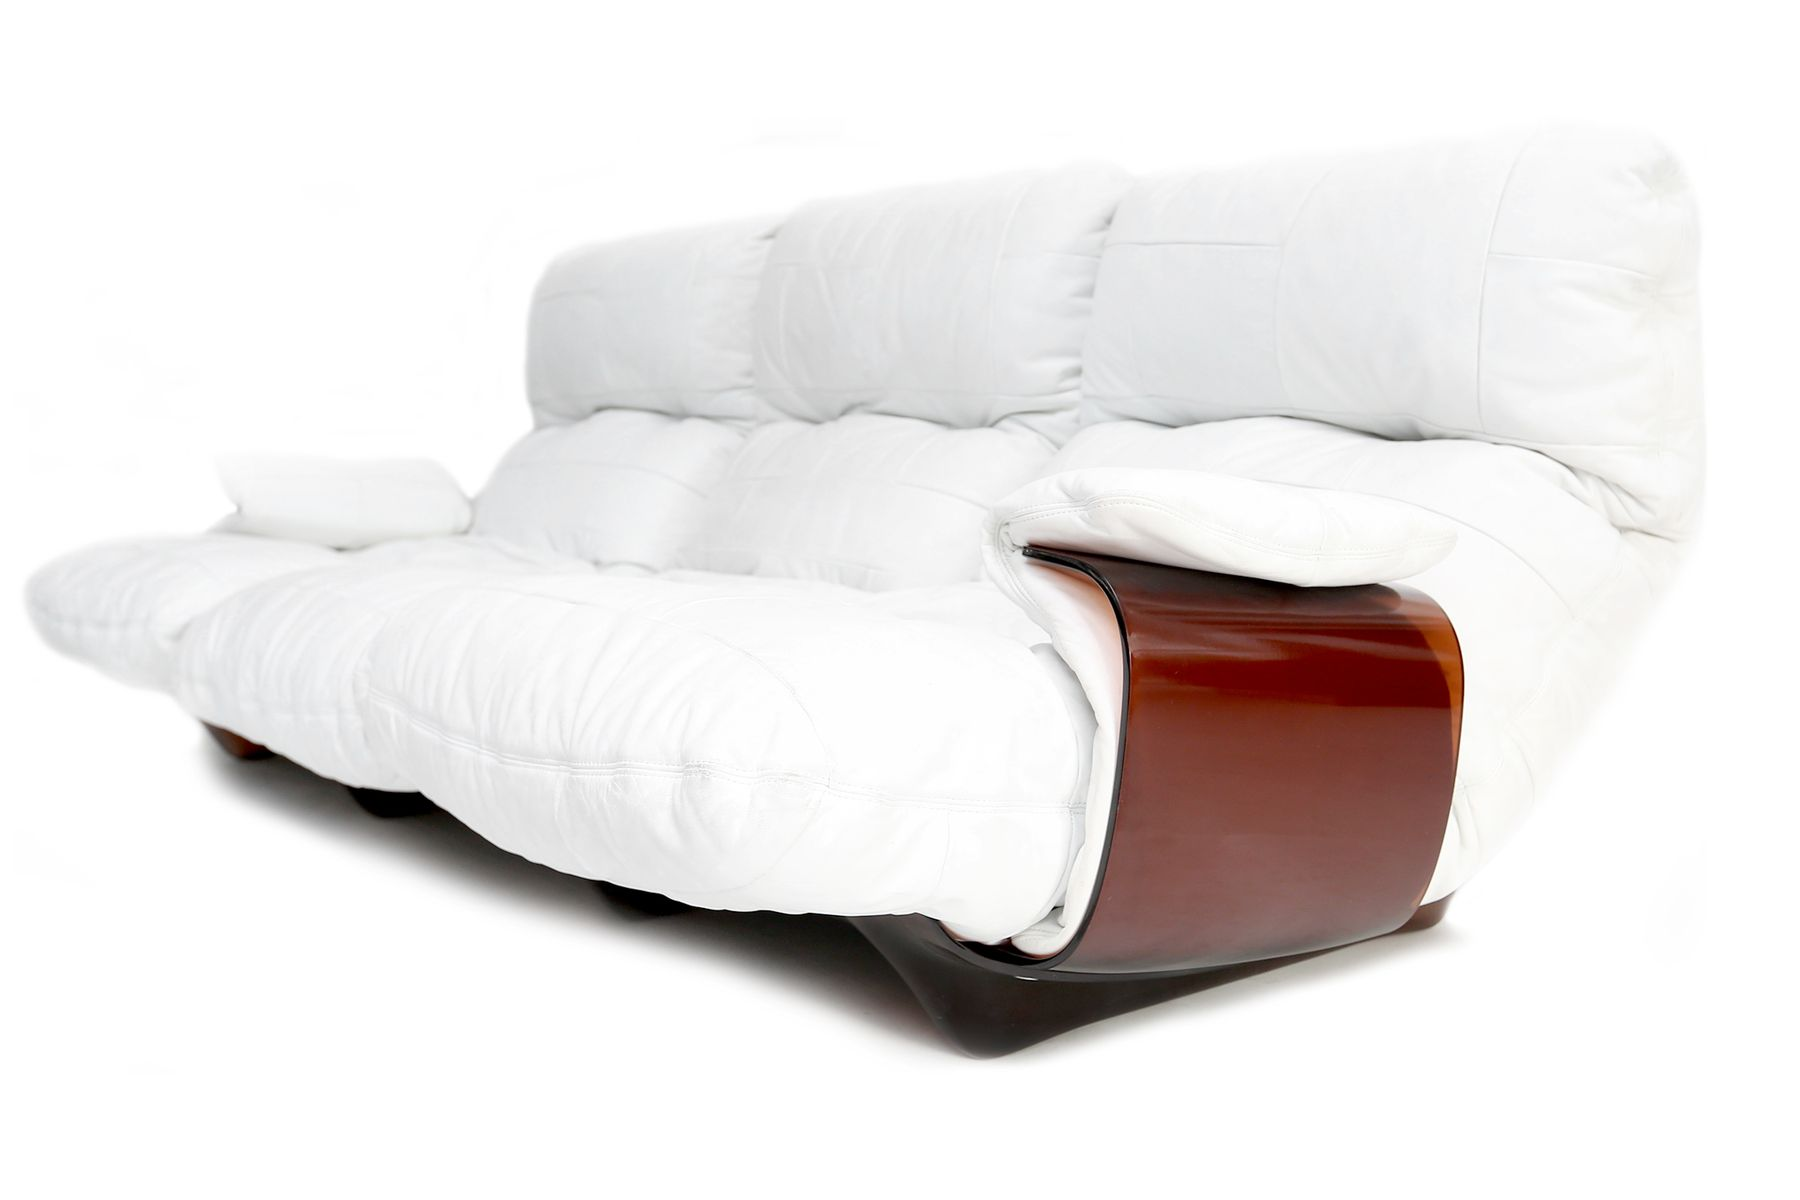 vente canape en ligne maison design. Black Bedroom Furniture Sets. Home Design Ideas